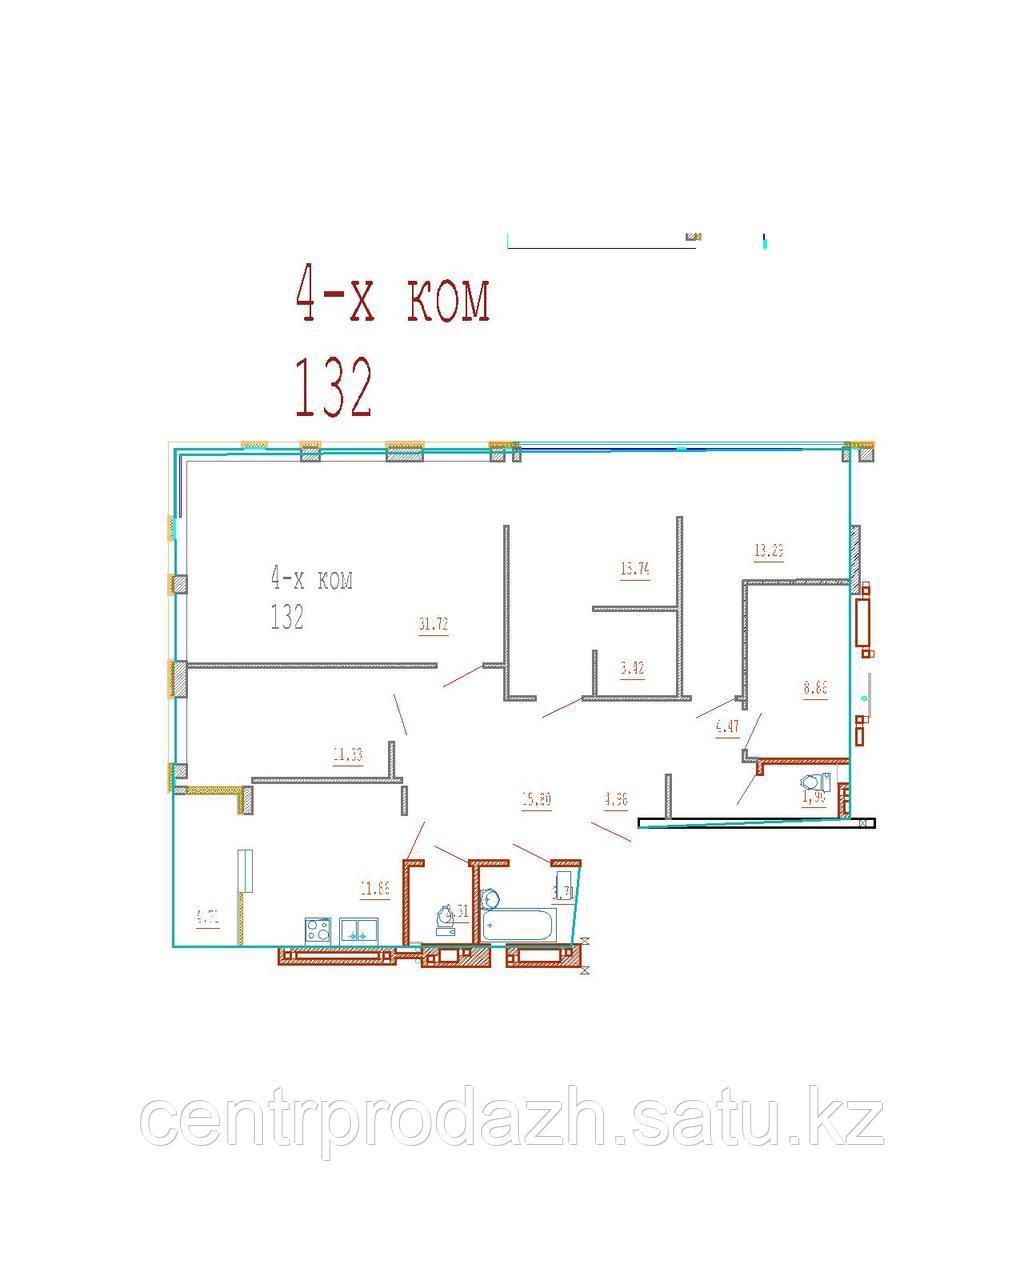 4 комнатная квартира в ЖК Кристалл 2 132 м²